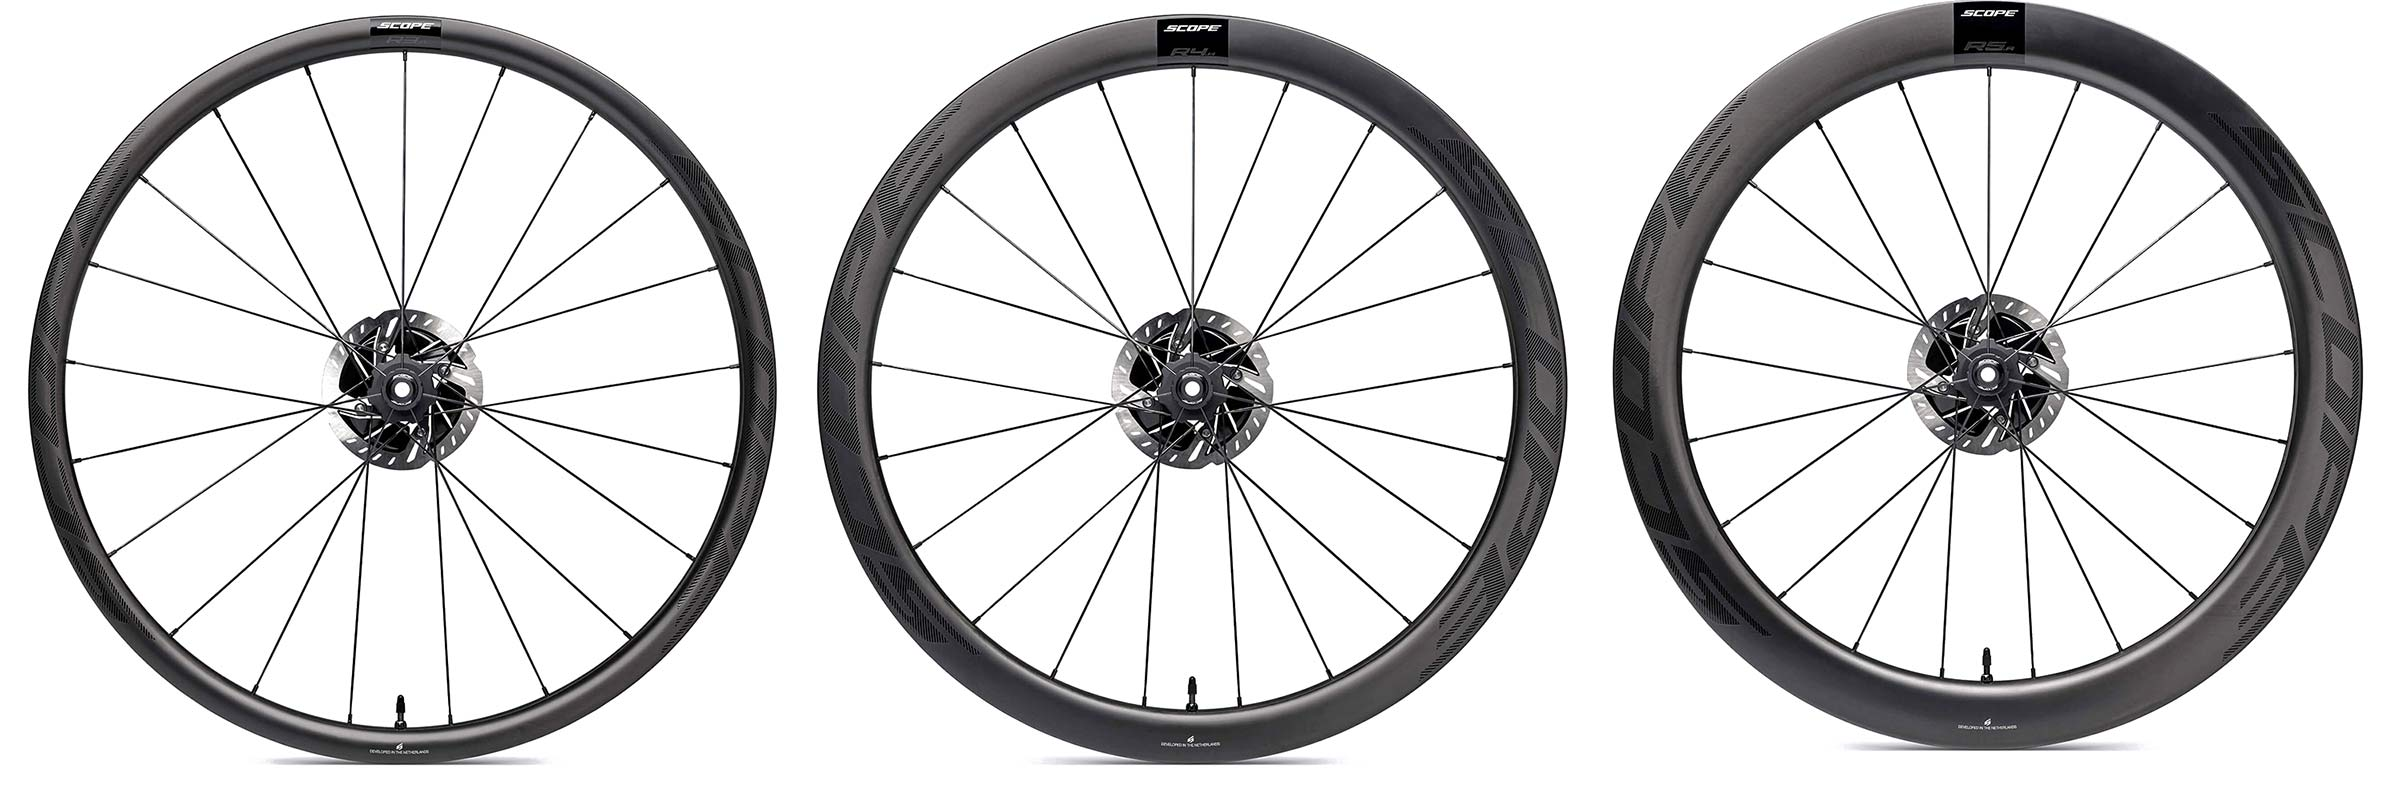 Scope All-Road aero carbon gravel bike wheels, lightweight aerodynamic tubeless rims